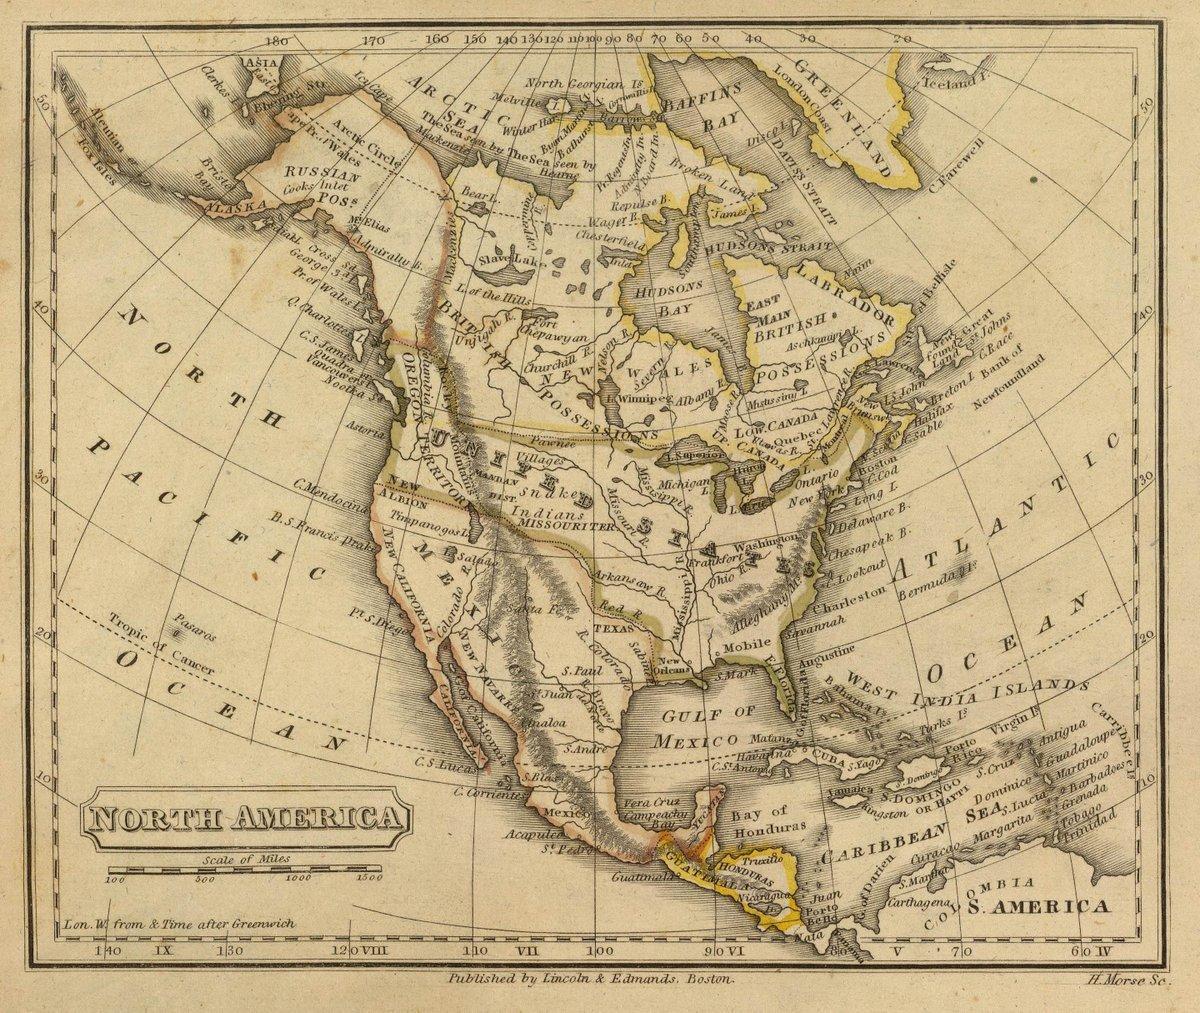 1832 School Atlas   North America. H. Morse Sc. Published by Lincoln & Edmands, Boston. (1832)   Antique Vintage Map Reprint